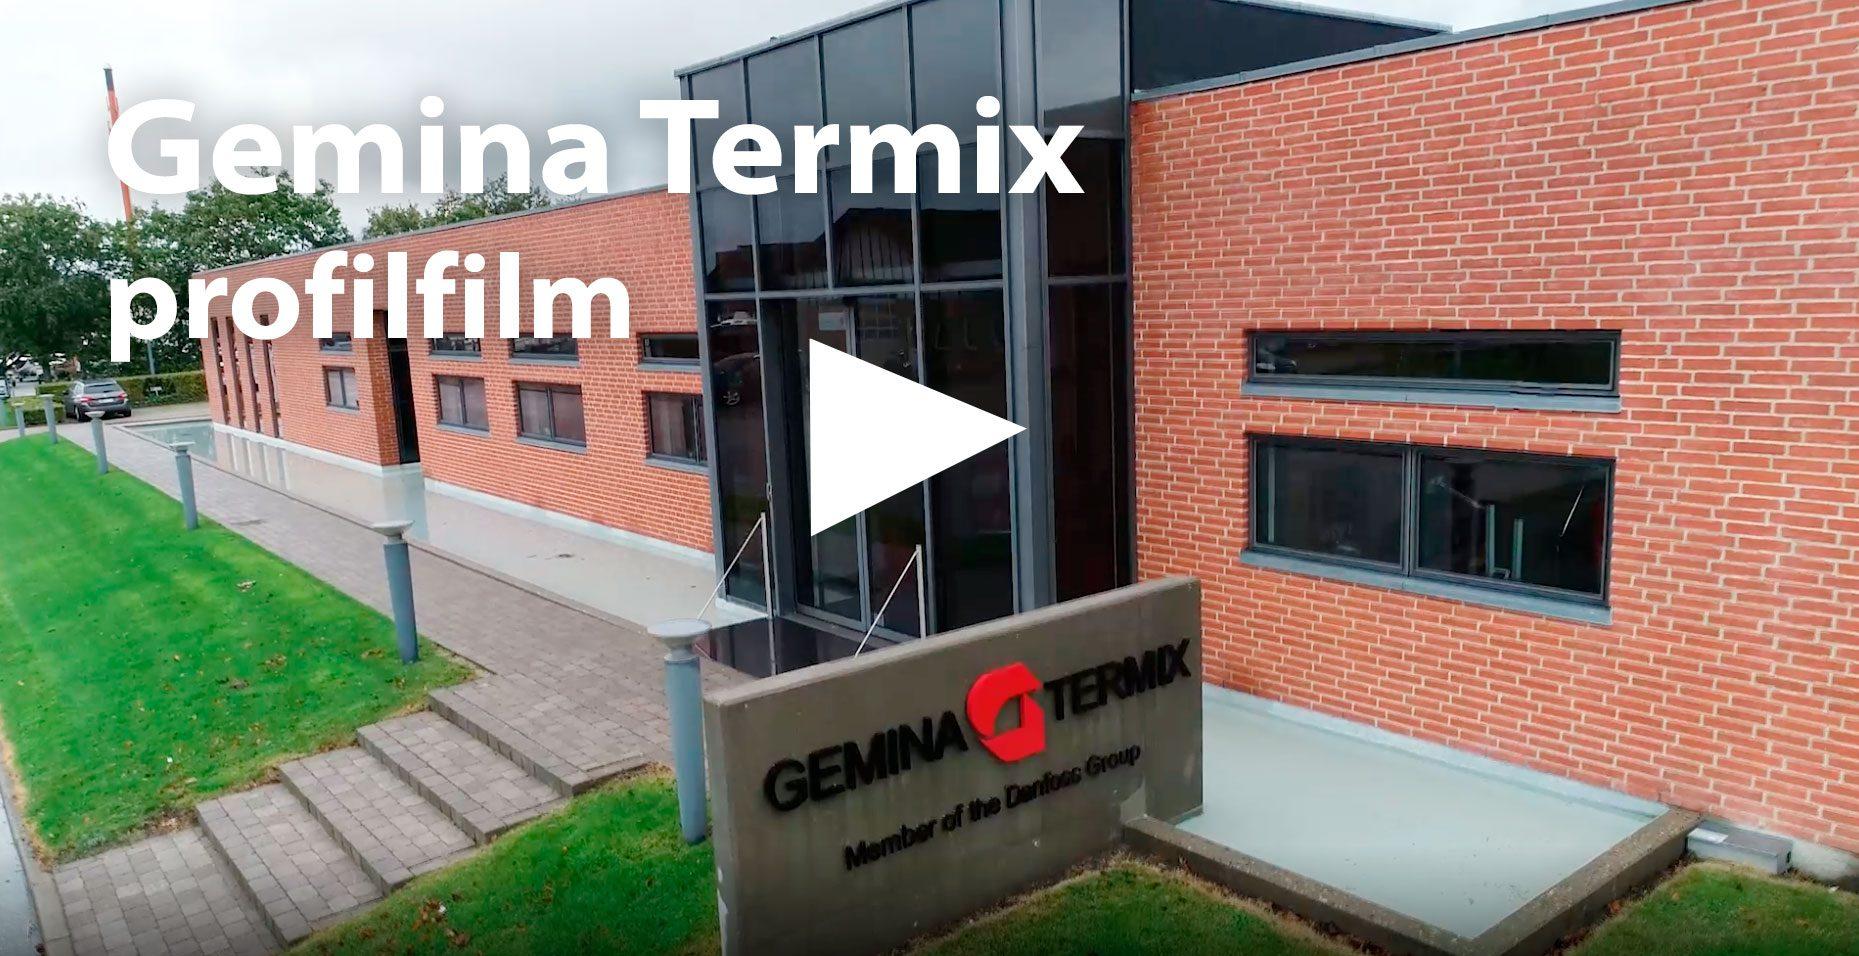 Gemina Termix profilfilm